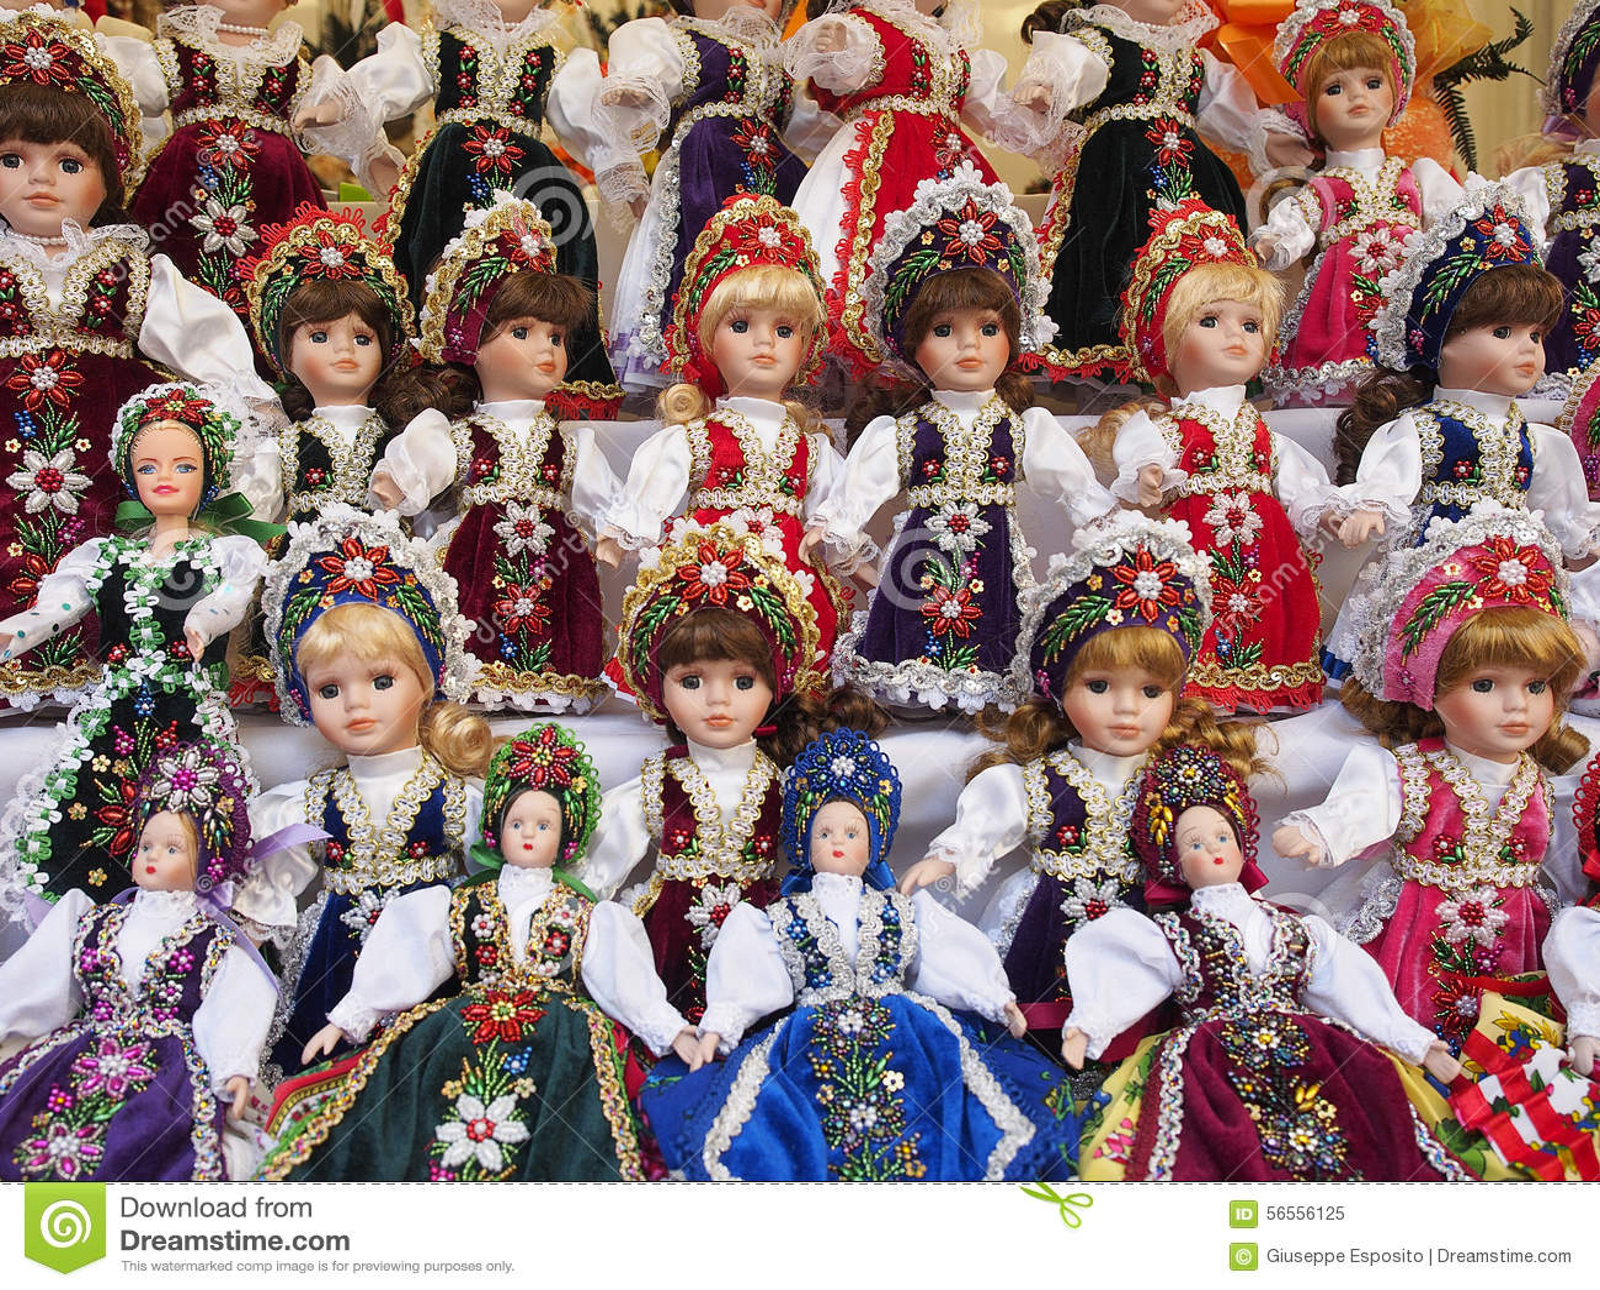 Download Κούκλες στην πώληση Γίνοντας στην Ανατολική Ευρώπη παιχνίδια Στοκ Εικόνα - εικόνα από αντικείμενο, ανατολικός: 56556125